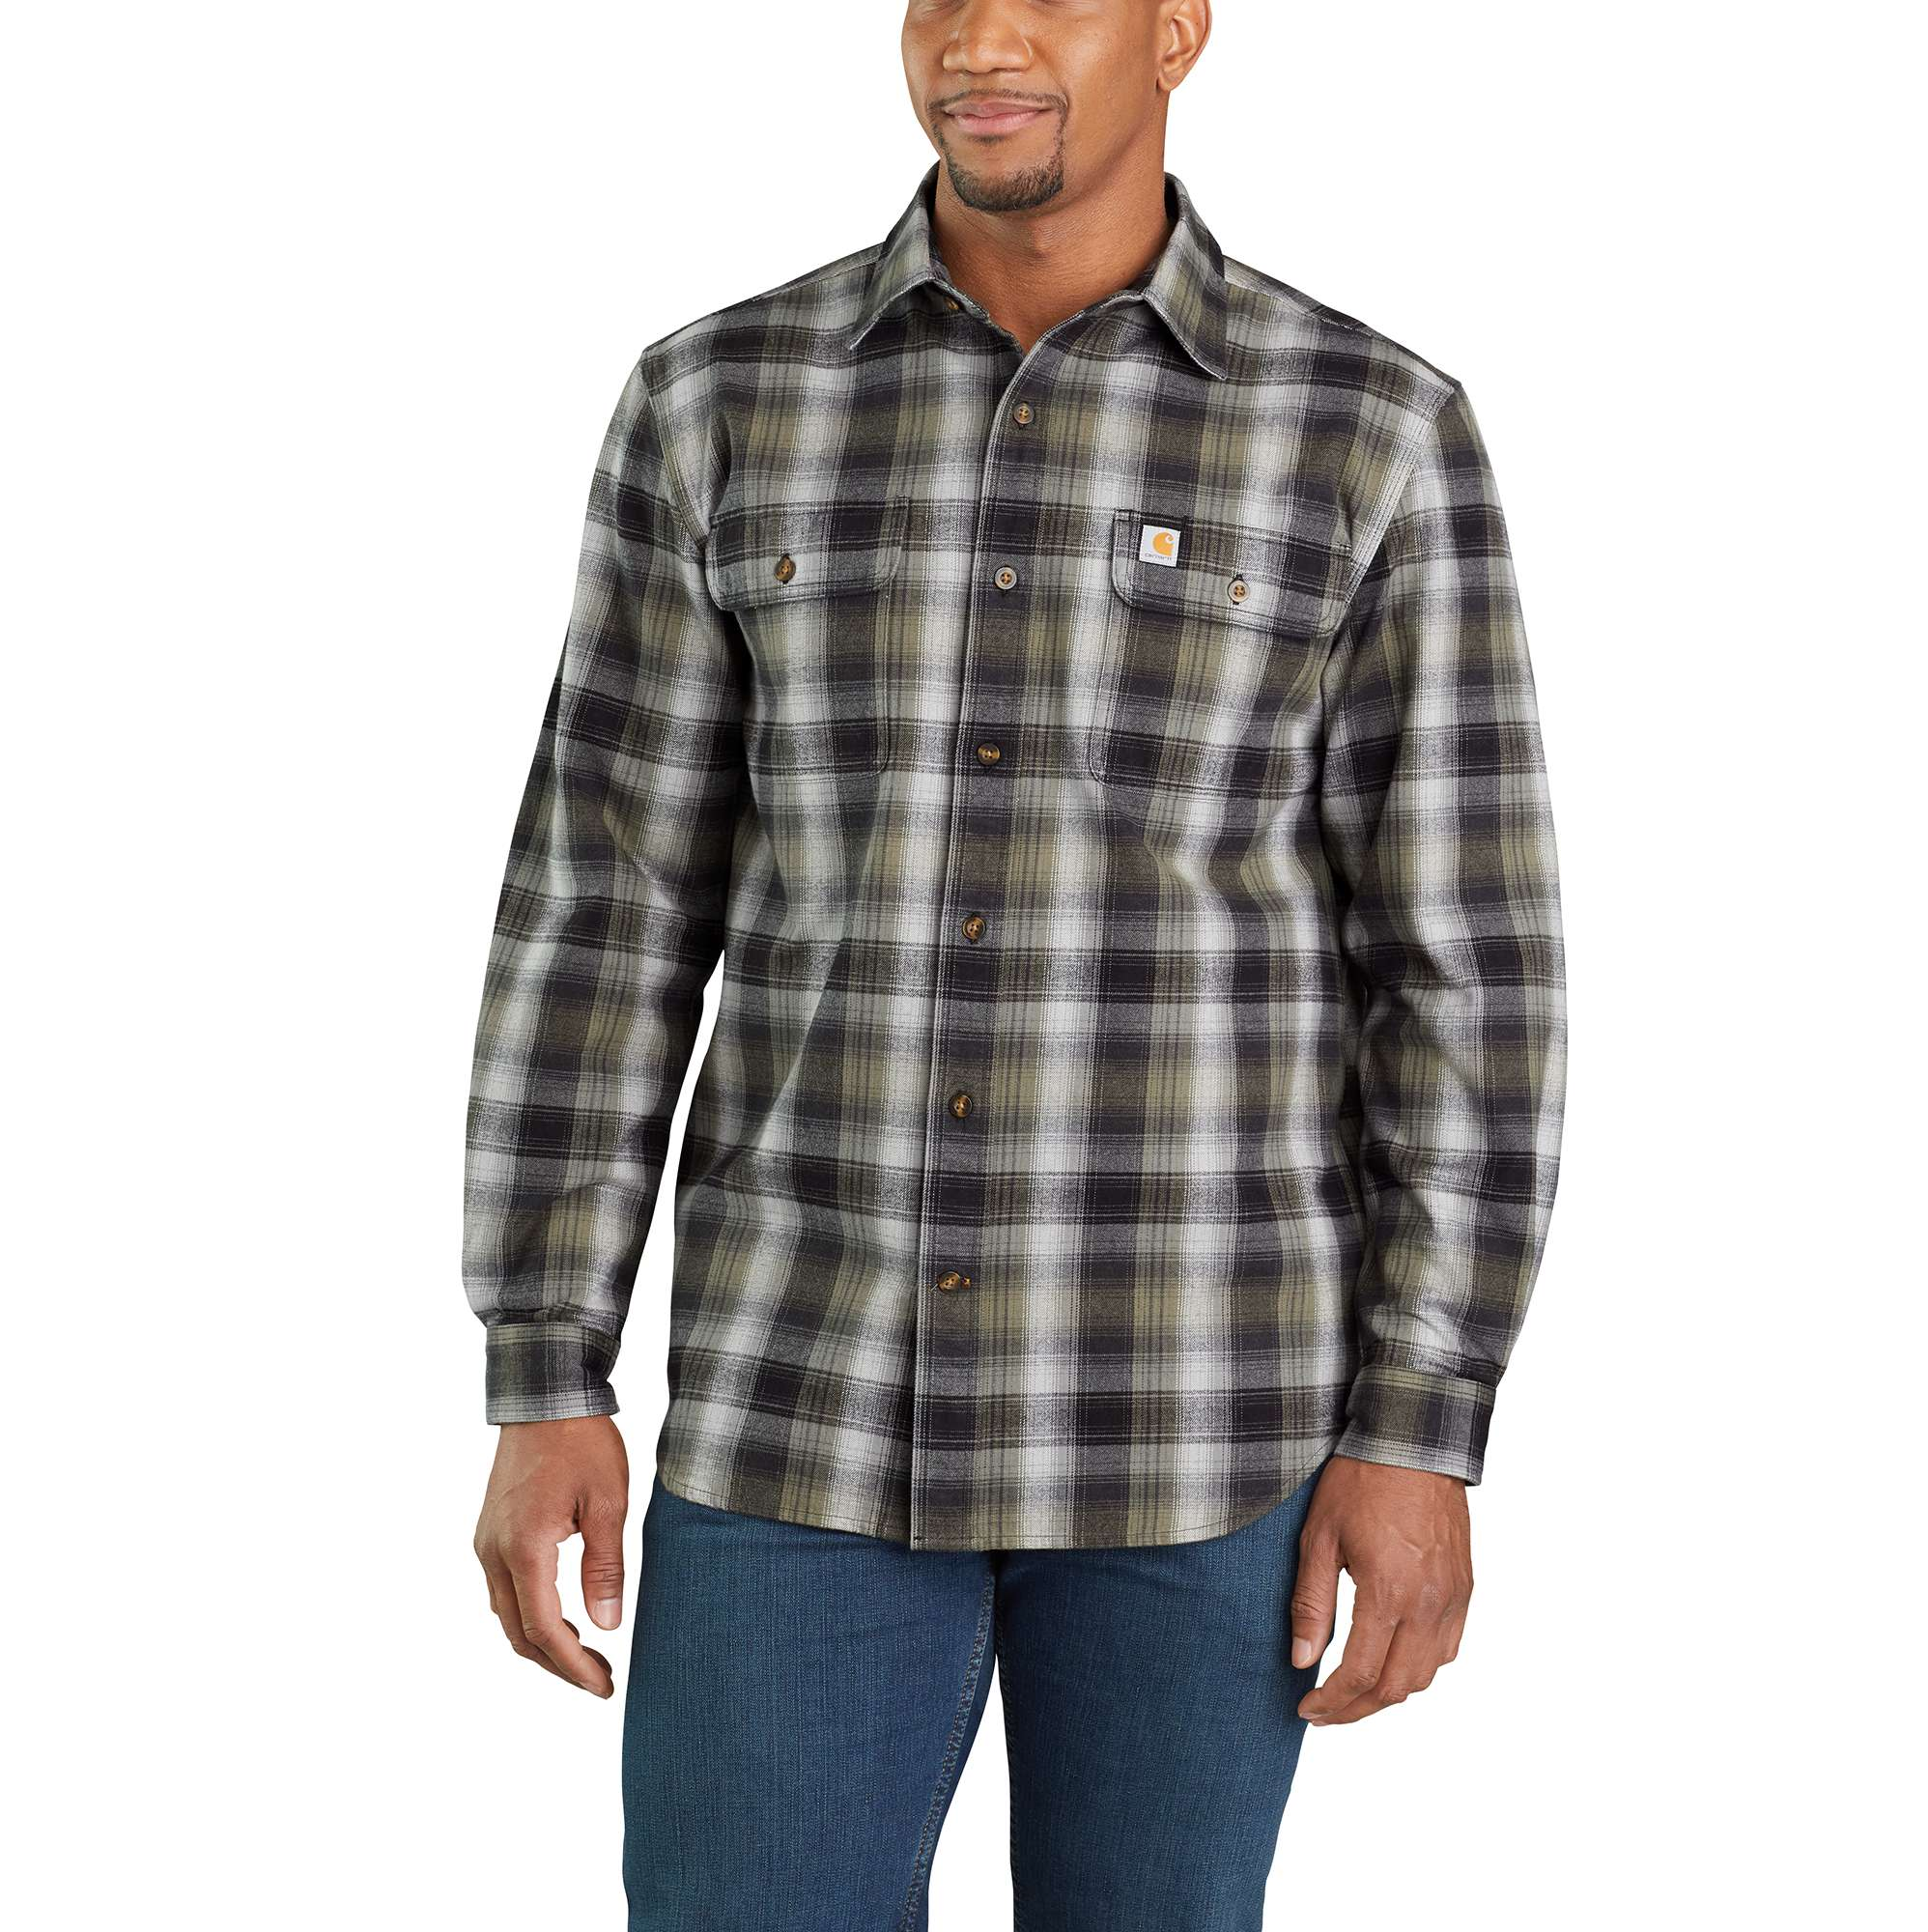 Carhartt Hubbard Plaid Flannel Shirt